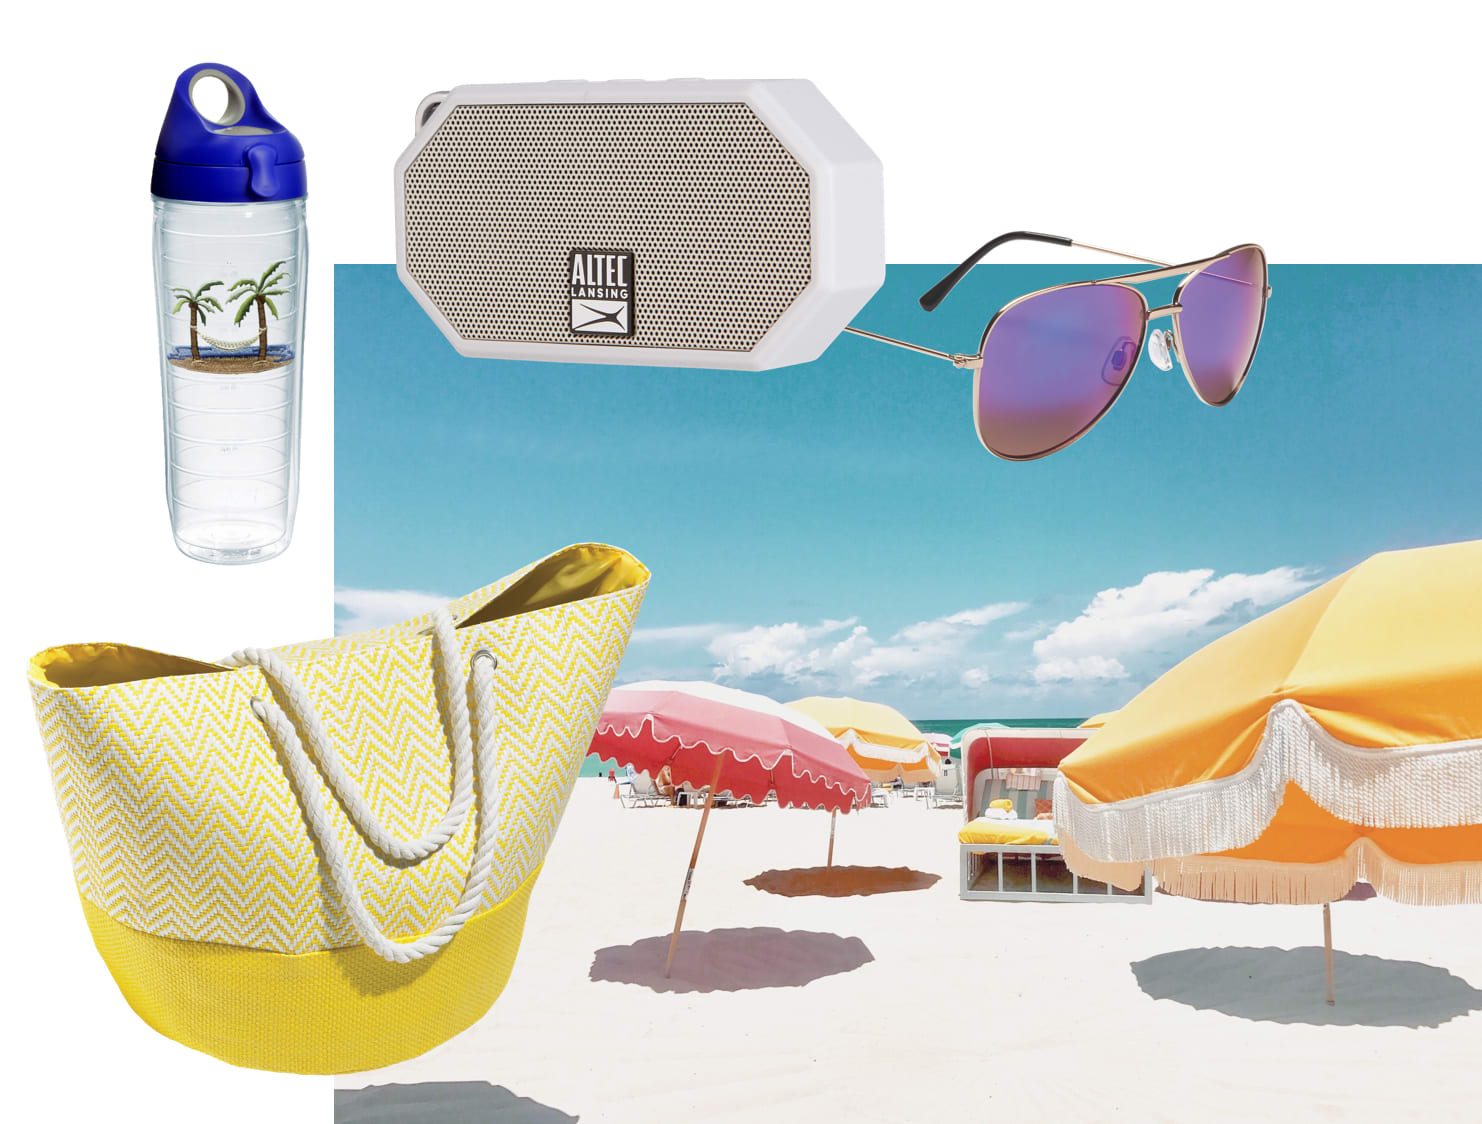 Beach Bag Filled With Summer Supplies